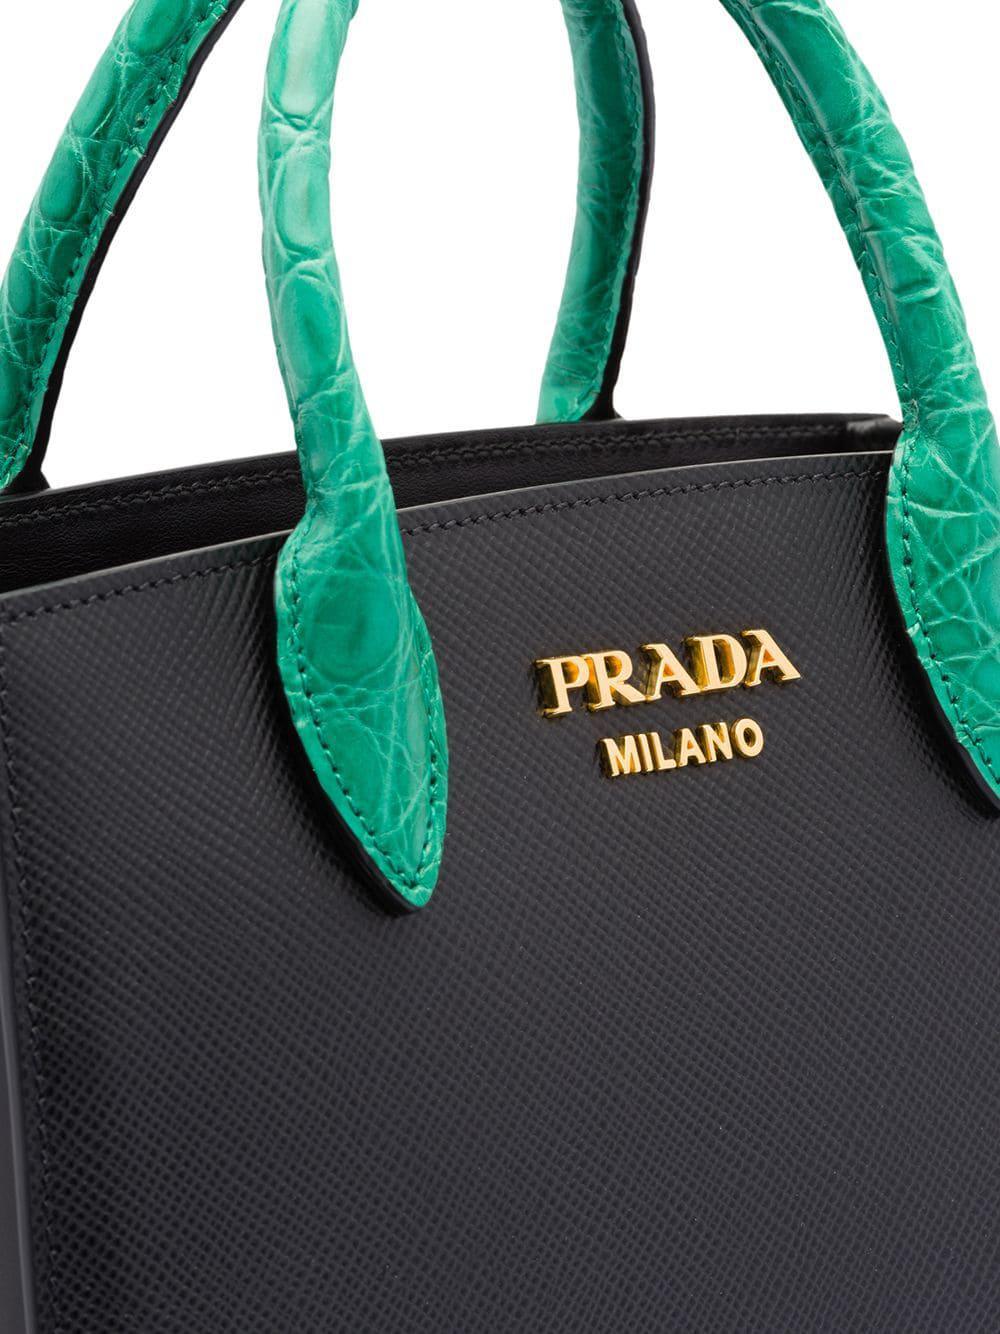 cdbf3f397ee8 Prada Saffiano Leather And Crocodile Bag in Black - Lyst